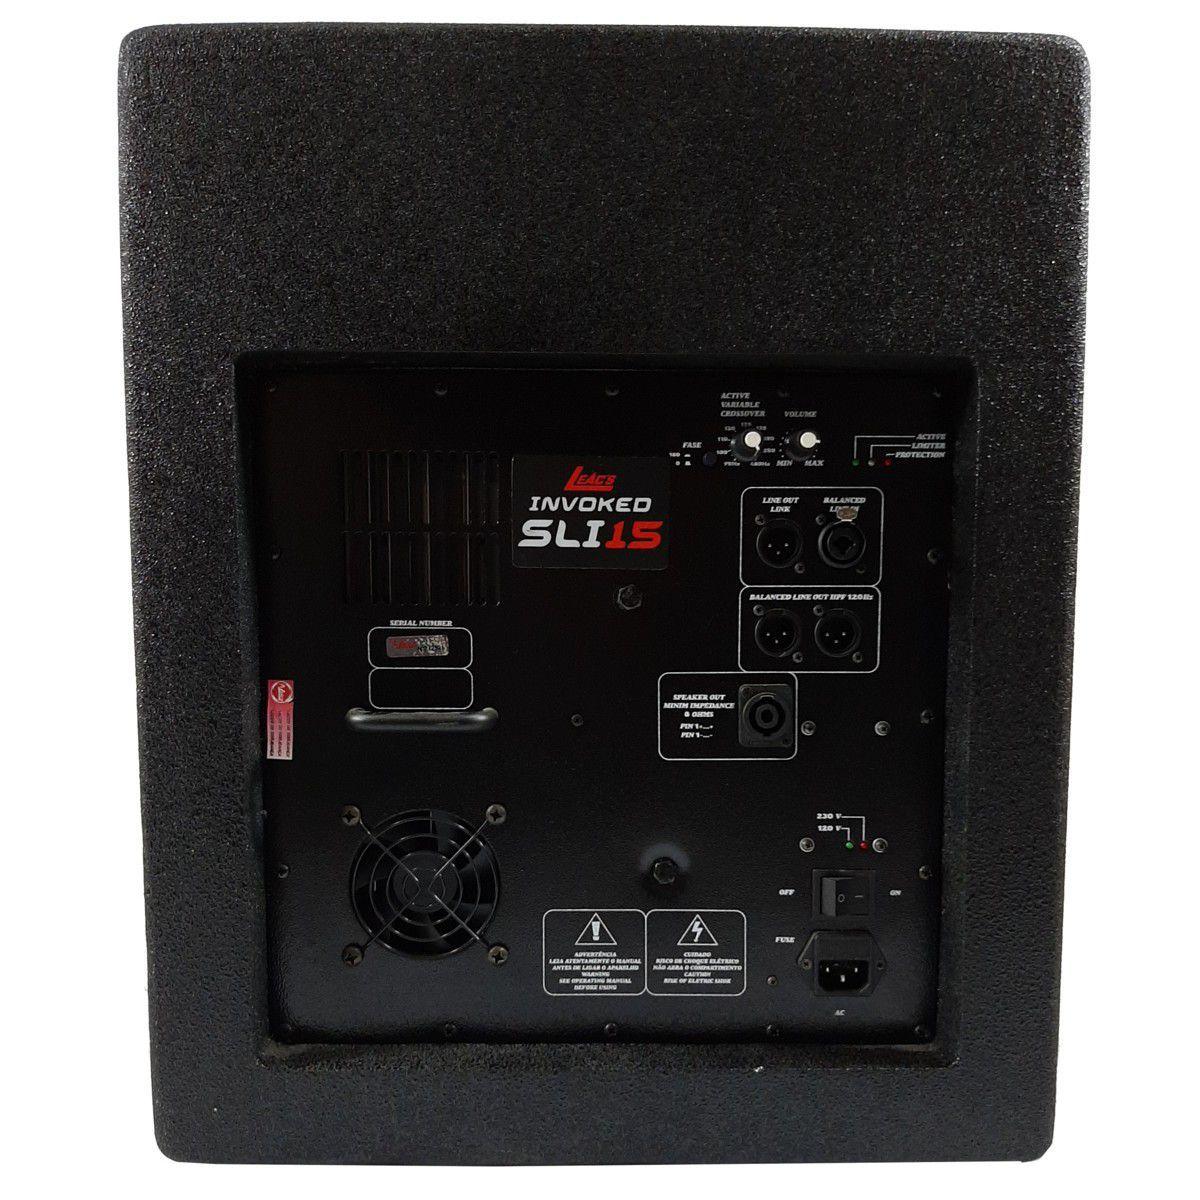 Kit Sub Woofer Ativo Passivo Leacs Sli1500 950w Rms